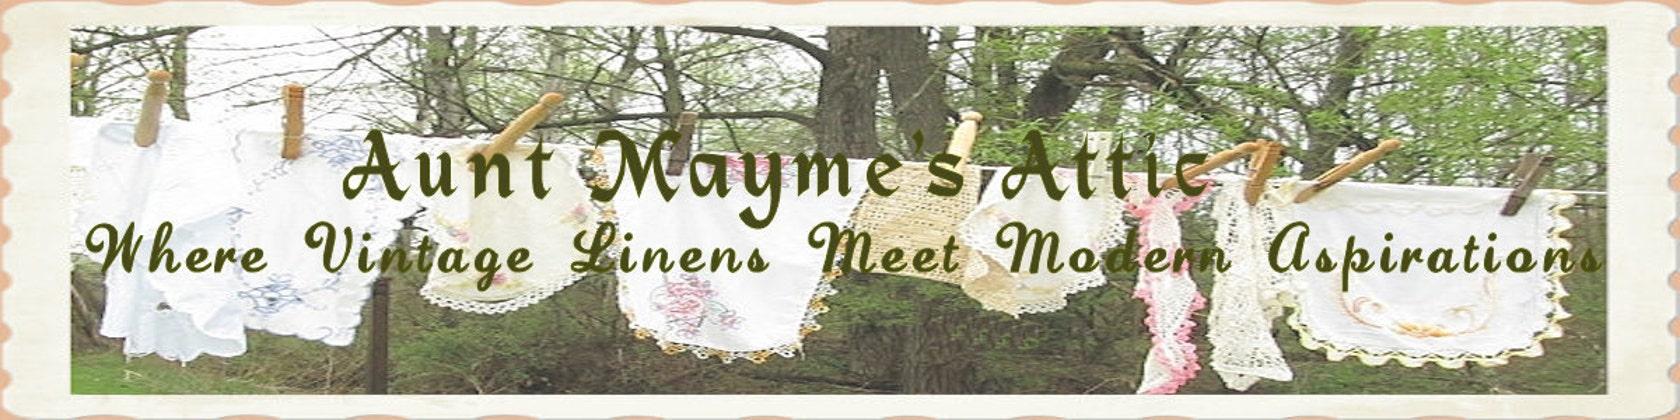 Aunt Maymes Attic Vintage Linens meet Modern Design